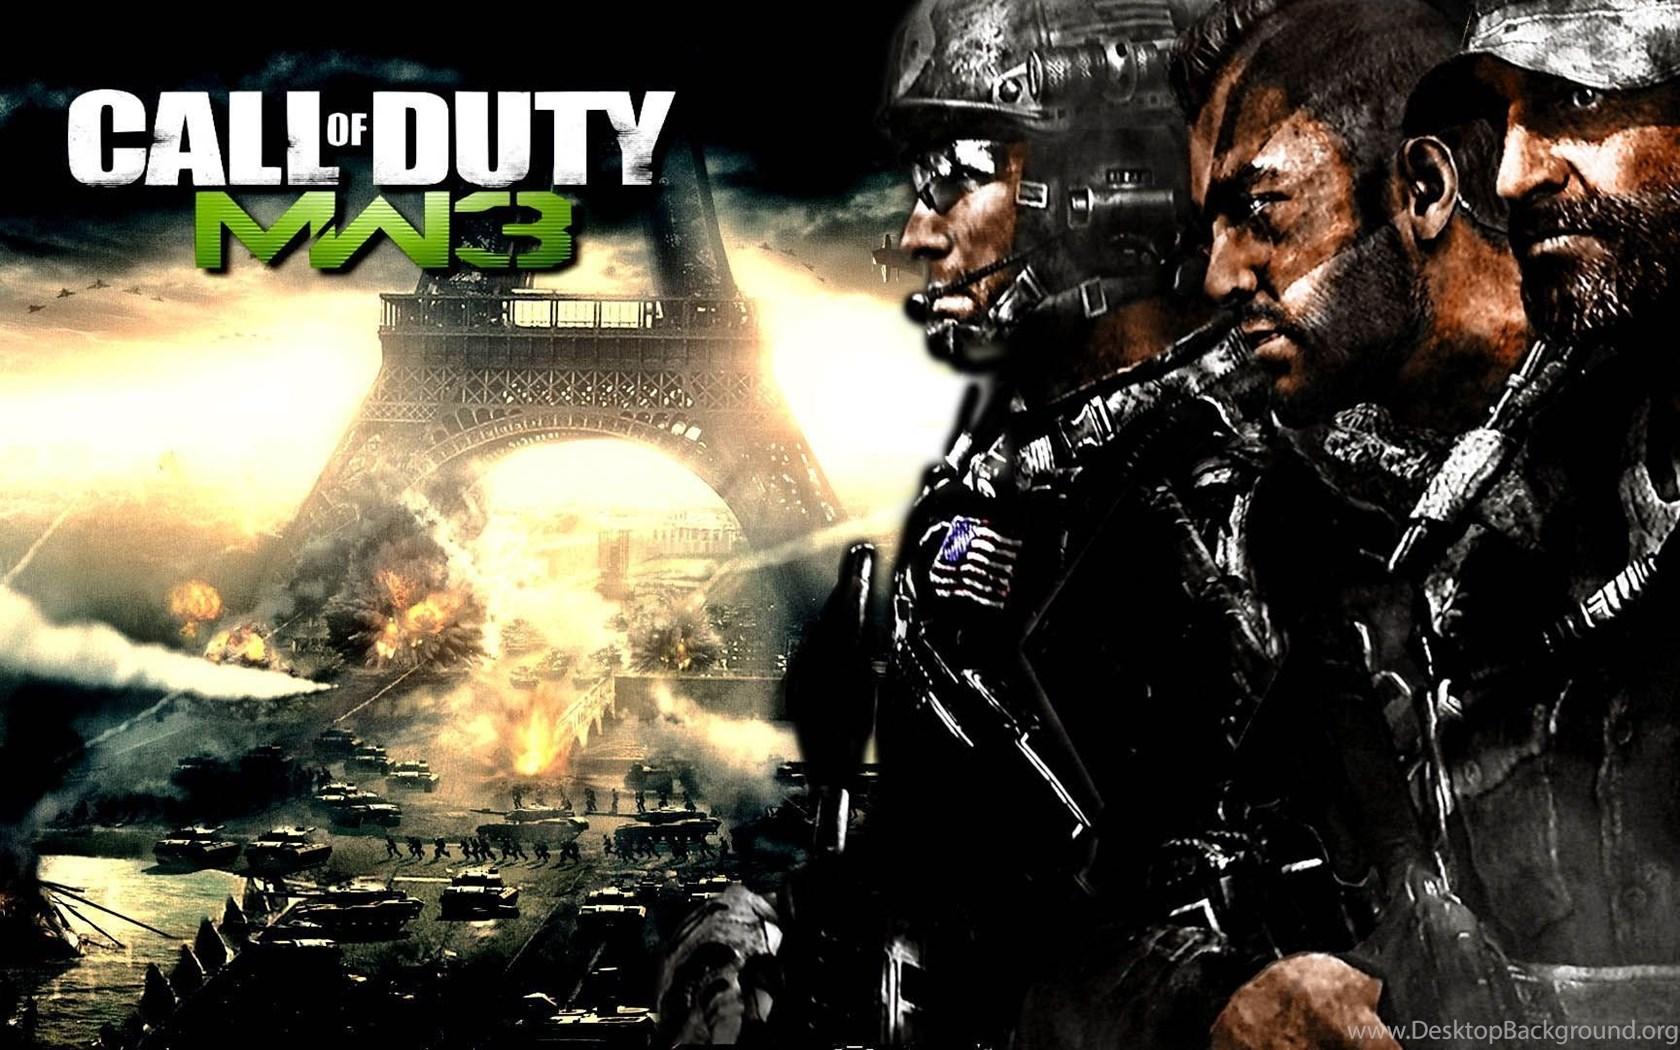 Call Of Duty Mw3 Wallpaper Hd 1080p 13 Desktop Background